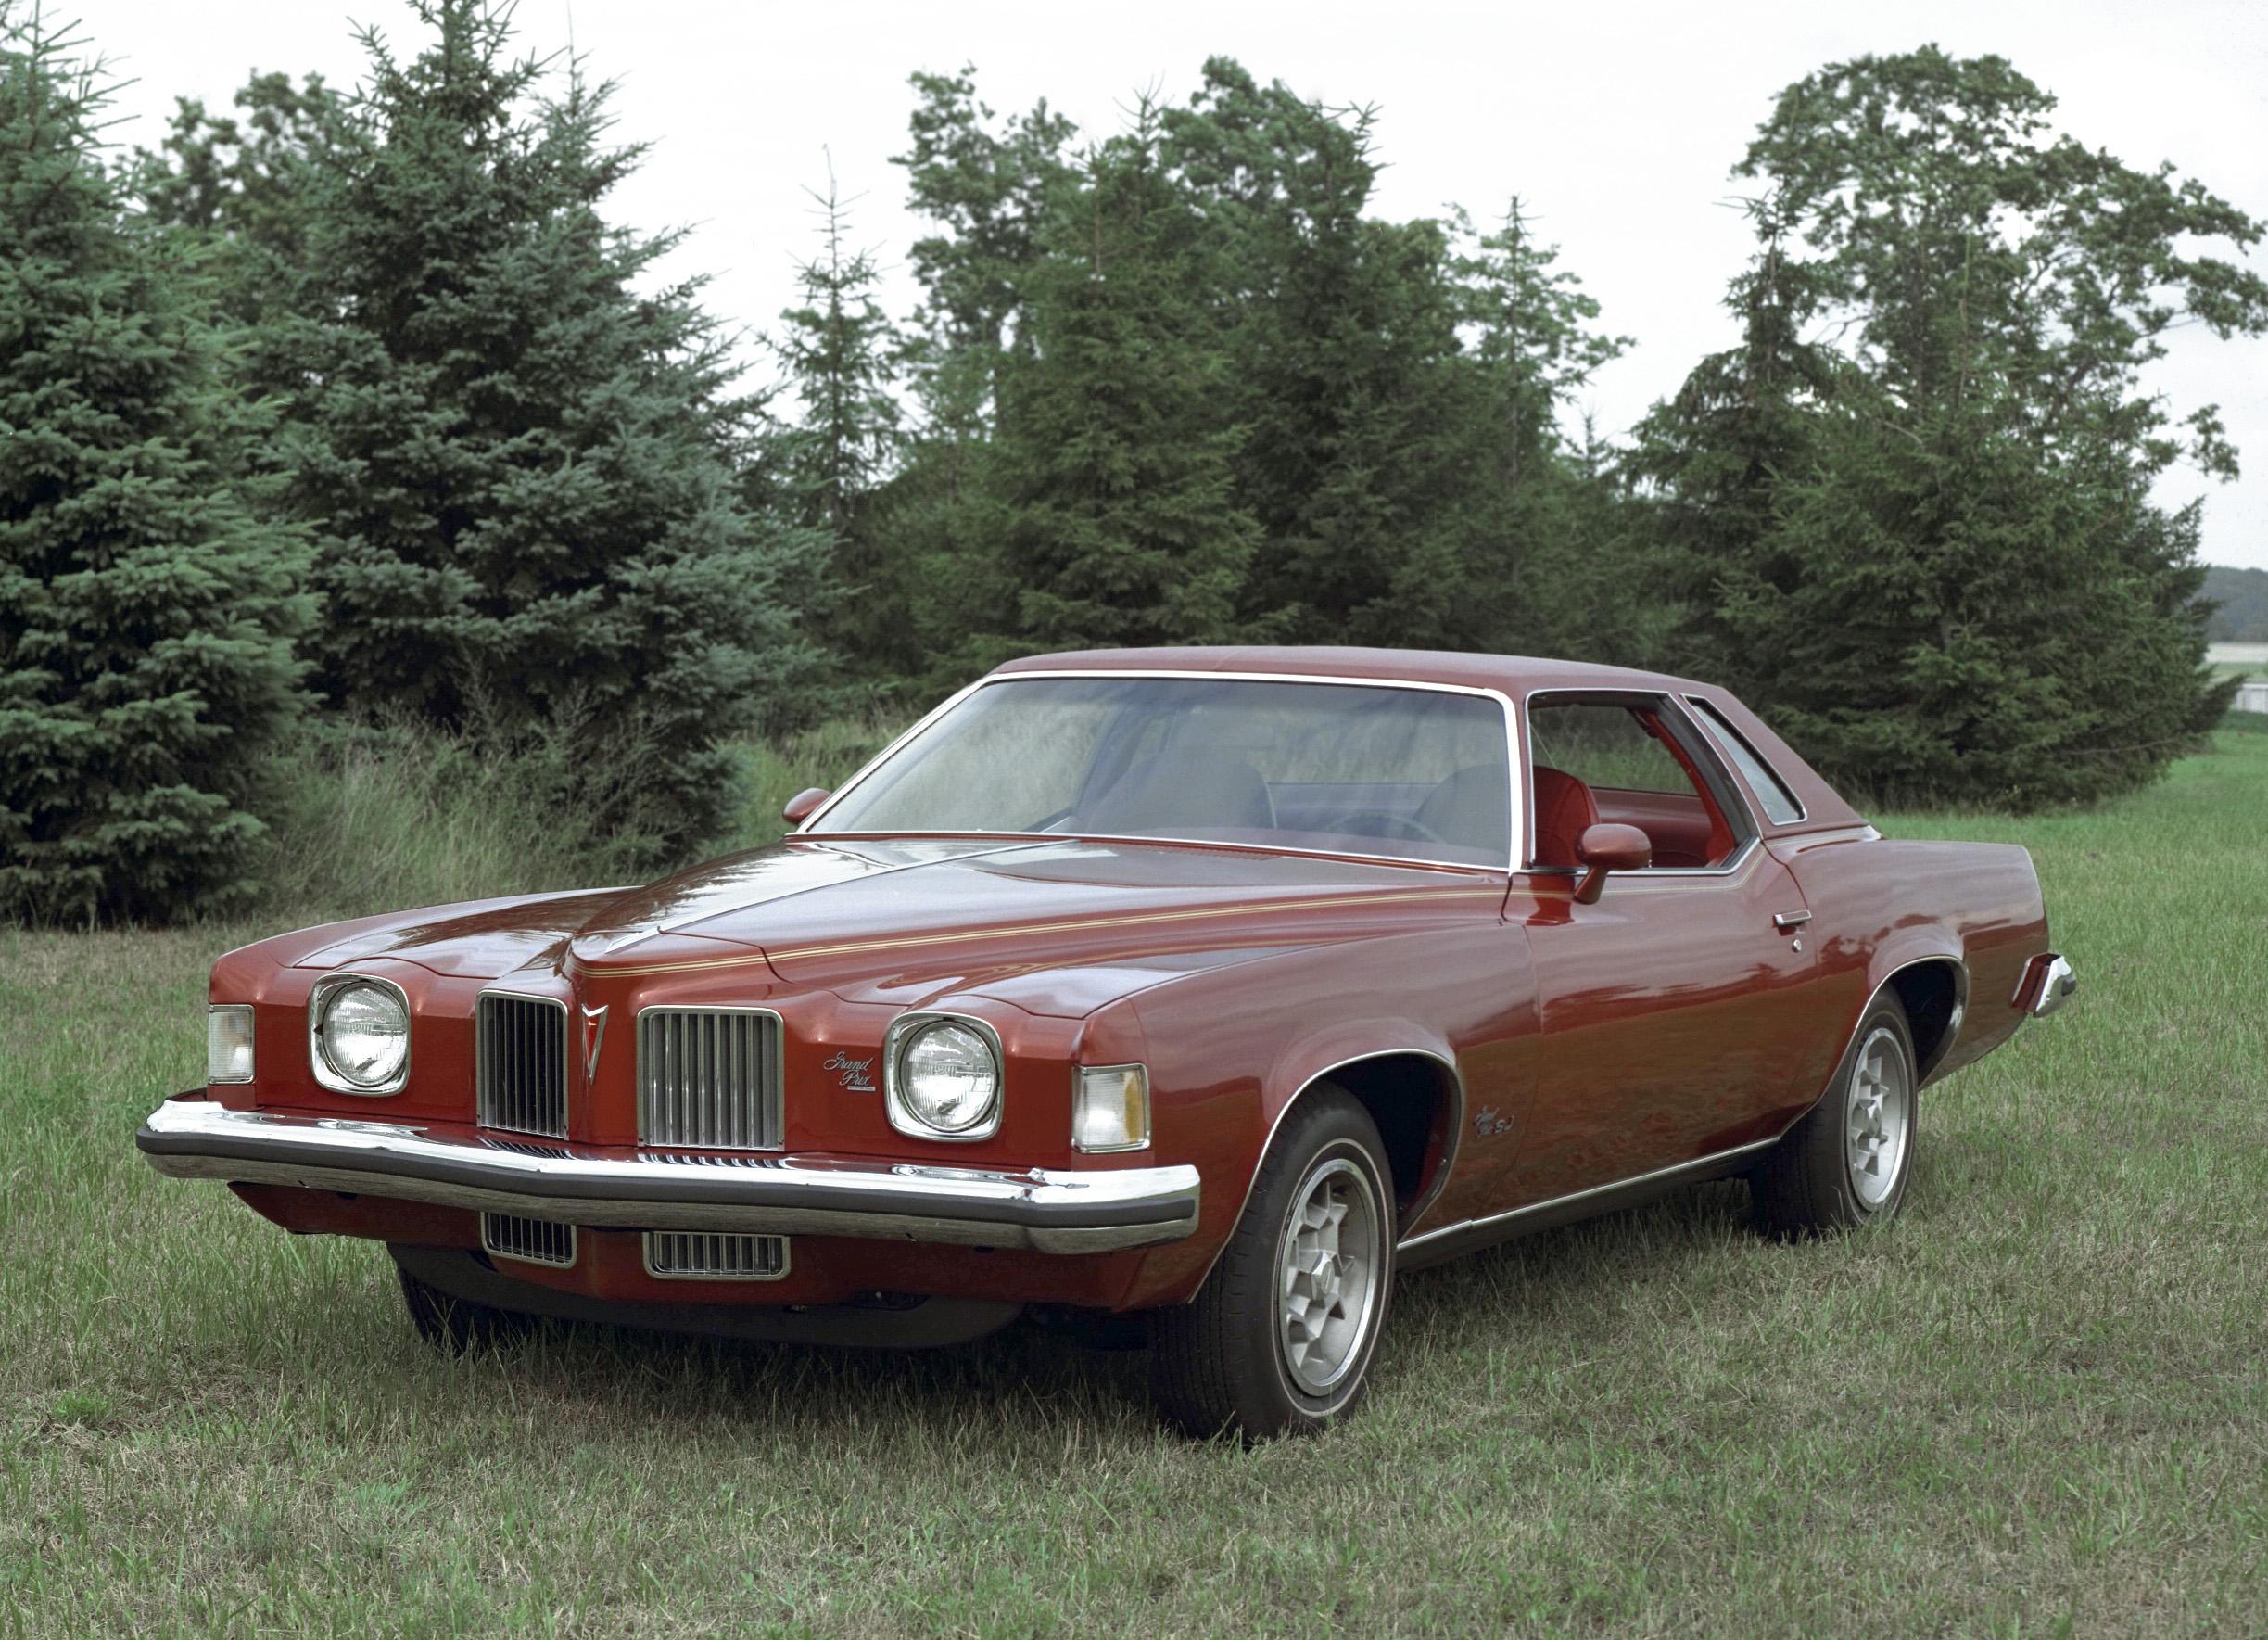 1973 pontiac grand prix front